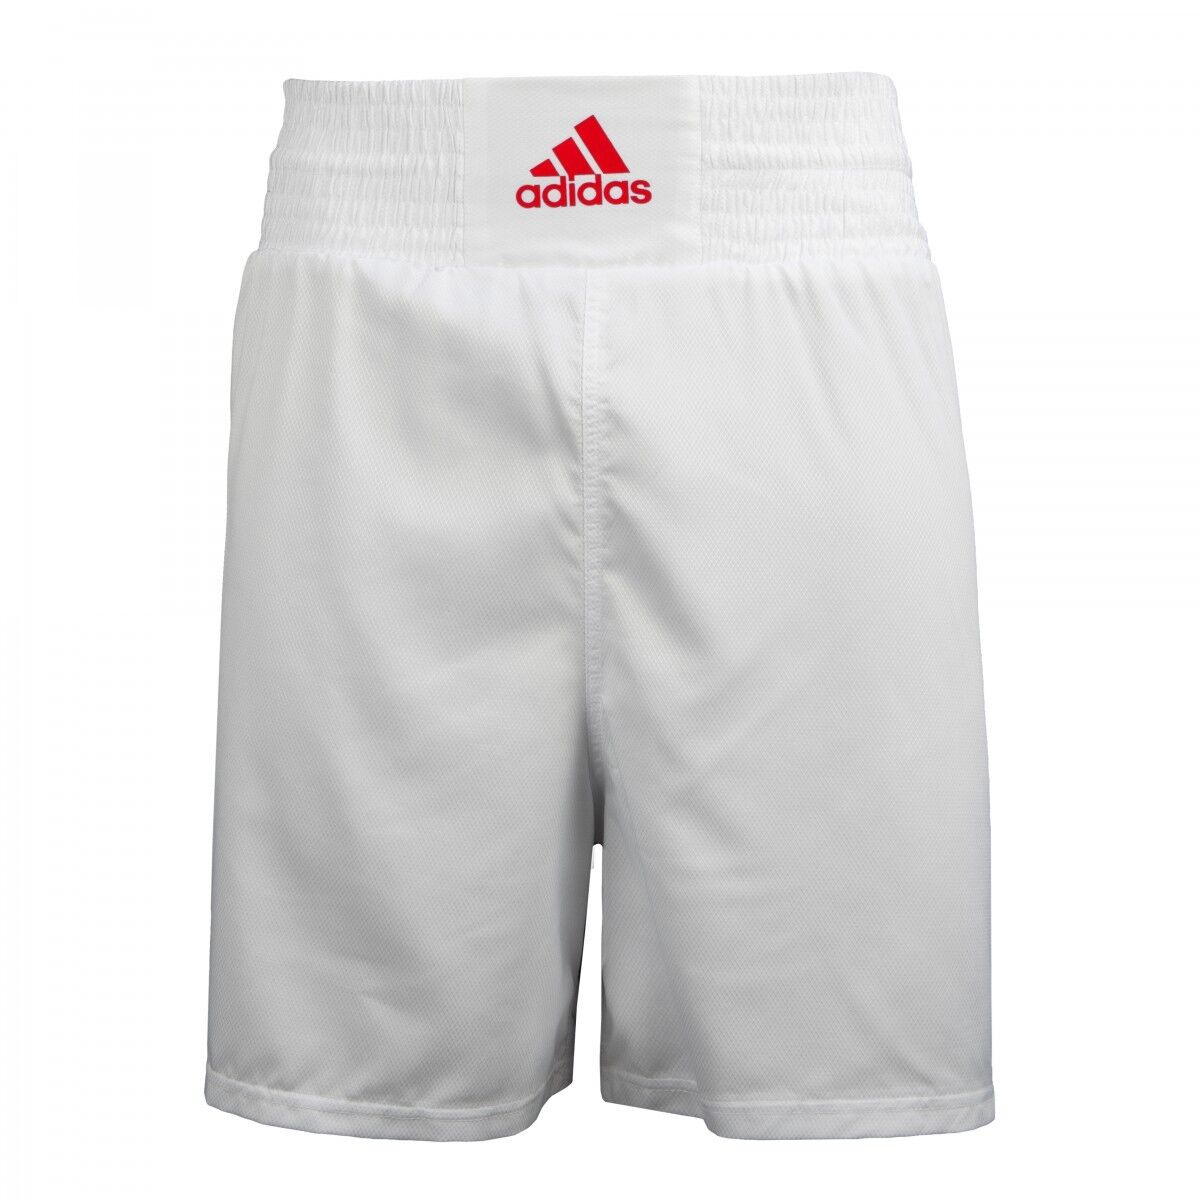 Adidas Boxing Training Red Diamond Shorts